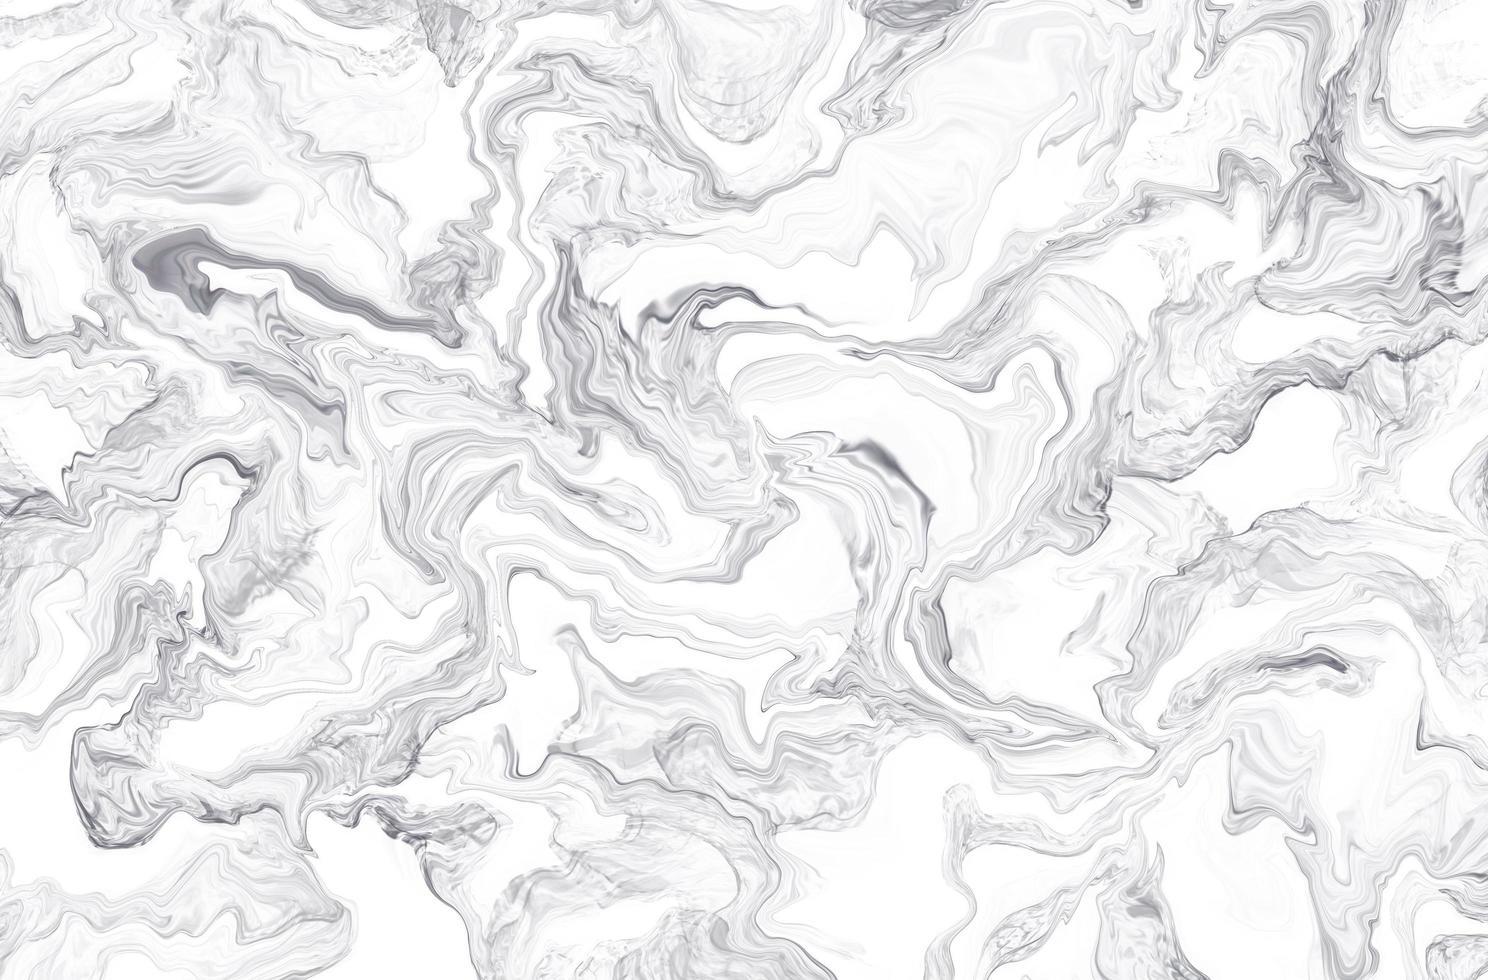 fond de texture irisée en marbre photo